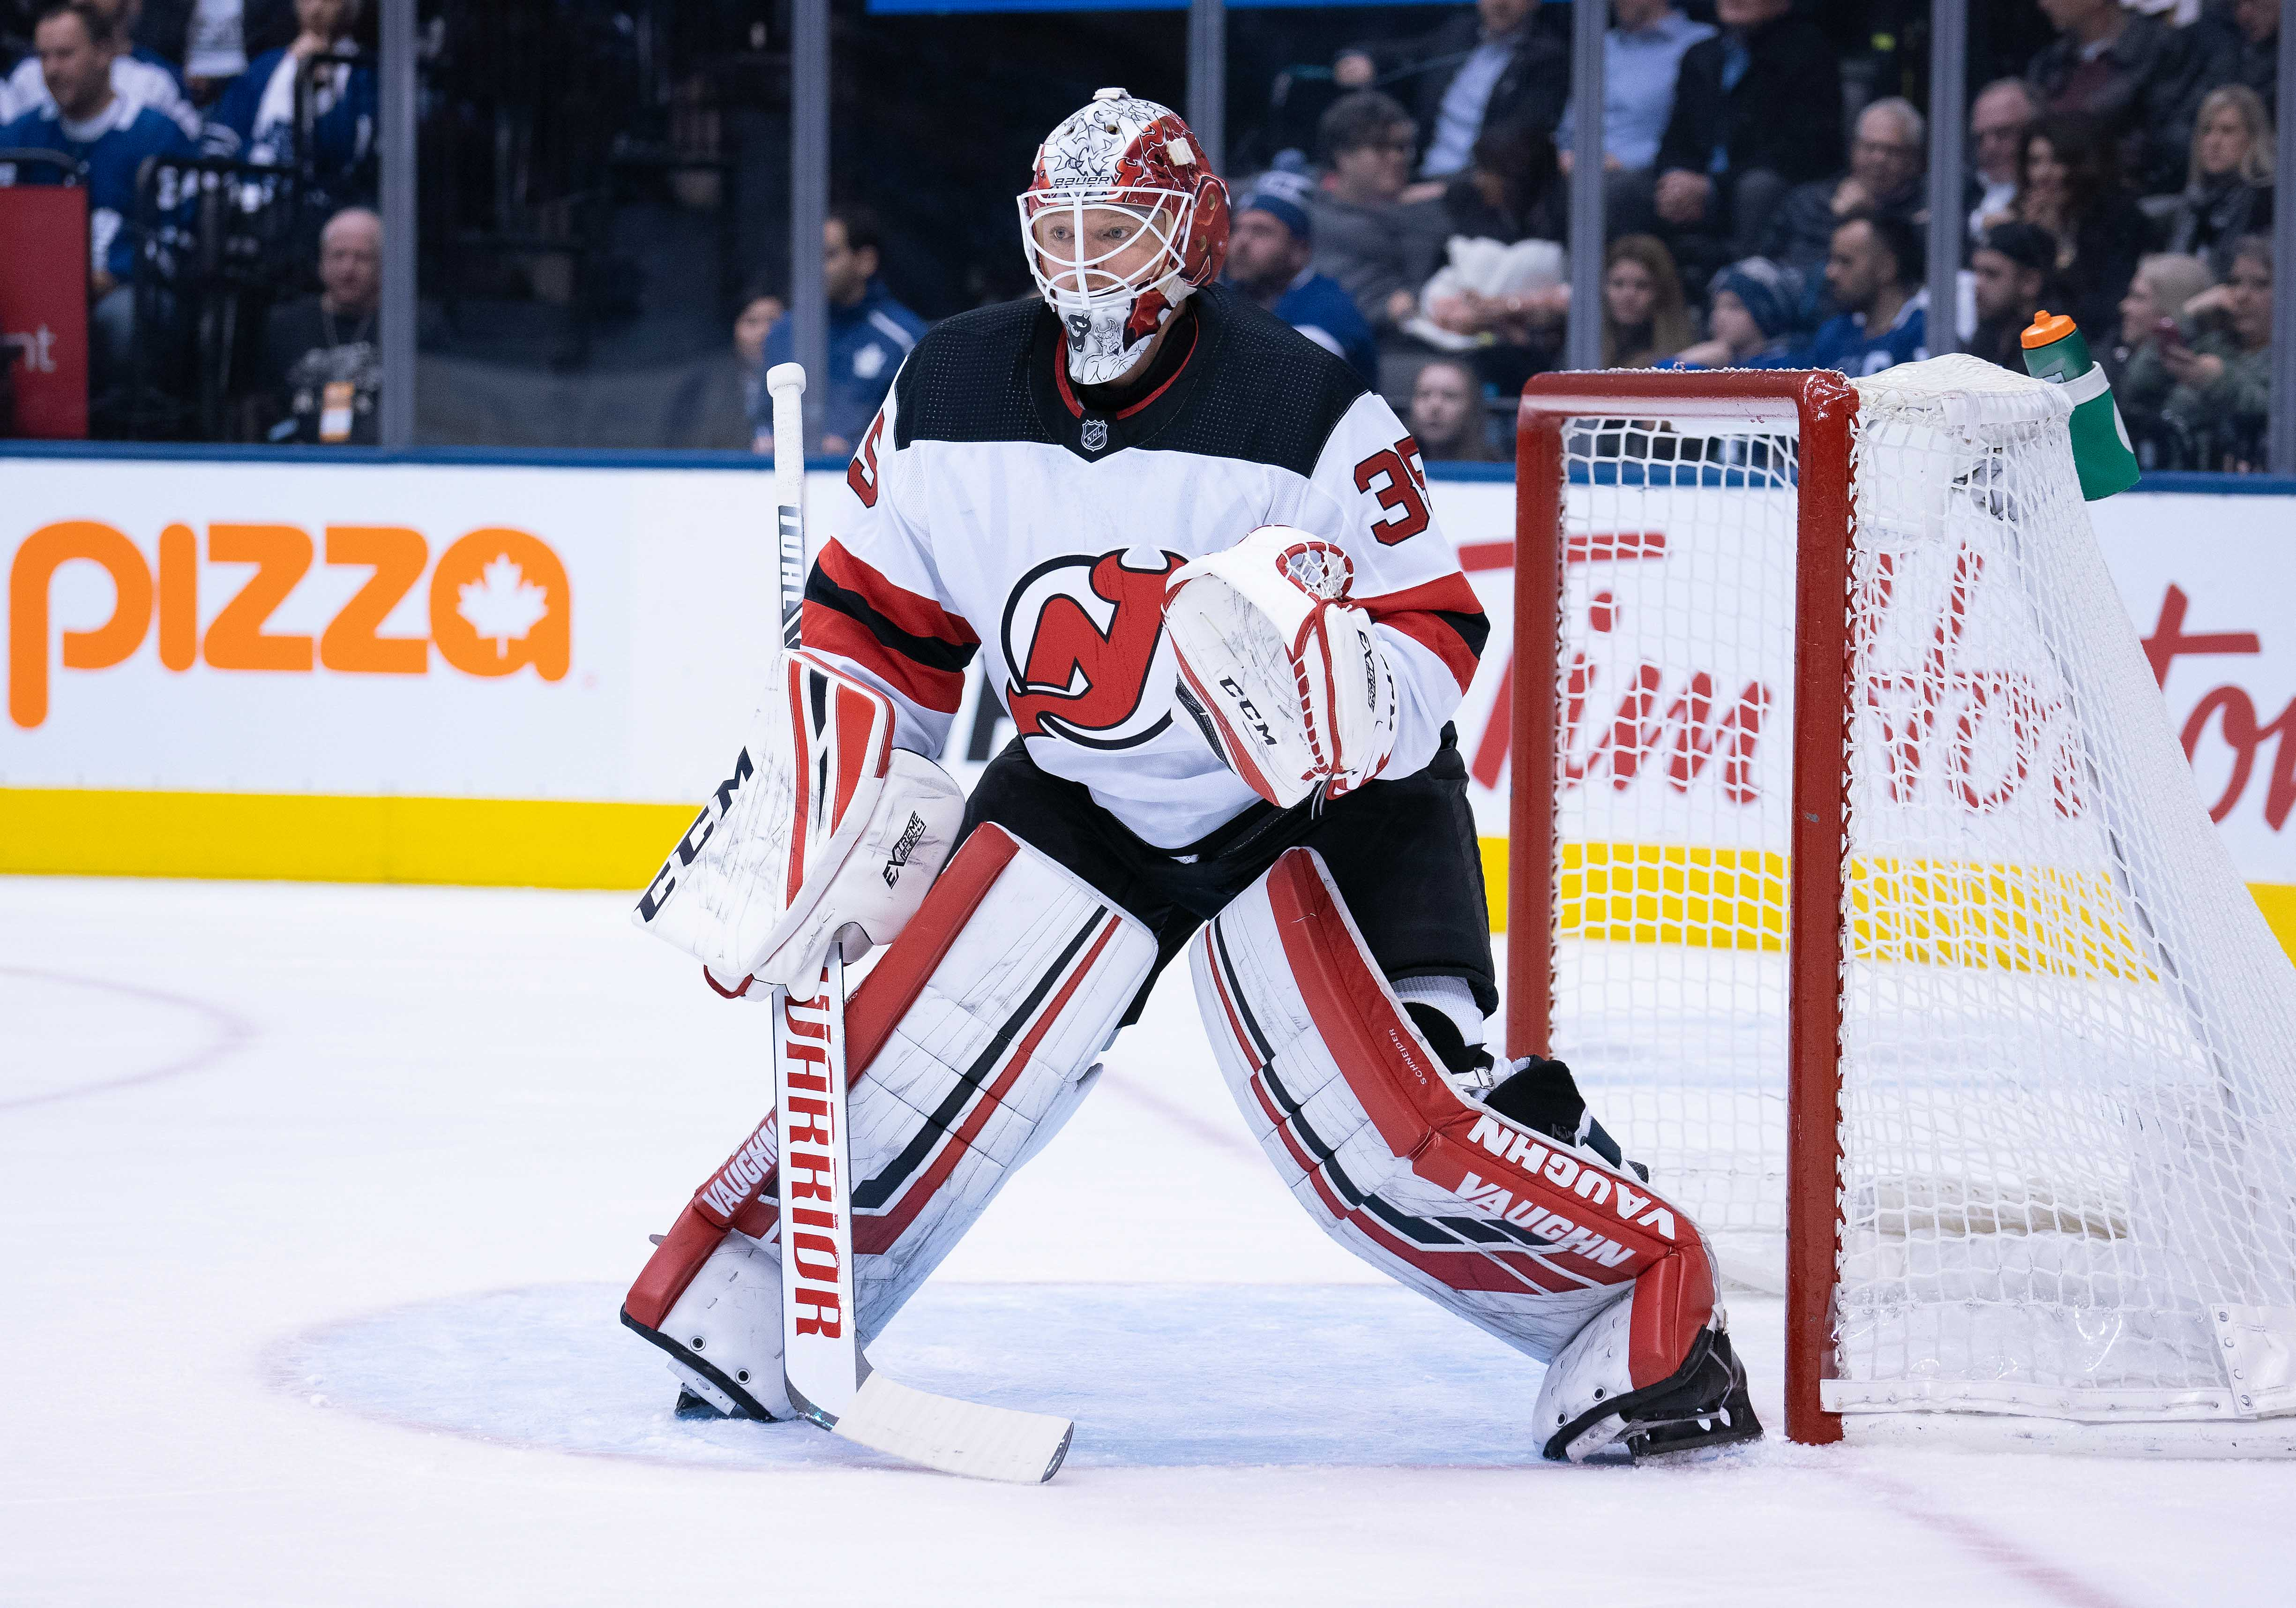 Cory Schneider picks up 26th NHL career shutout